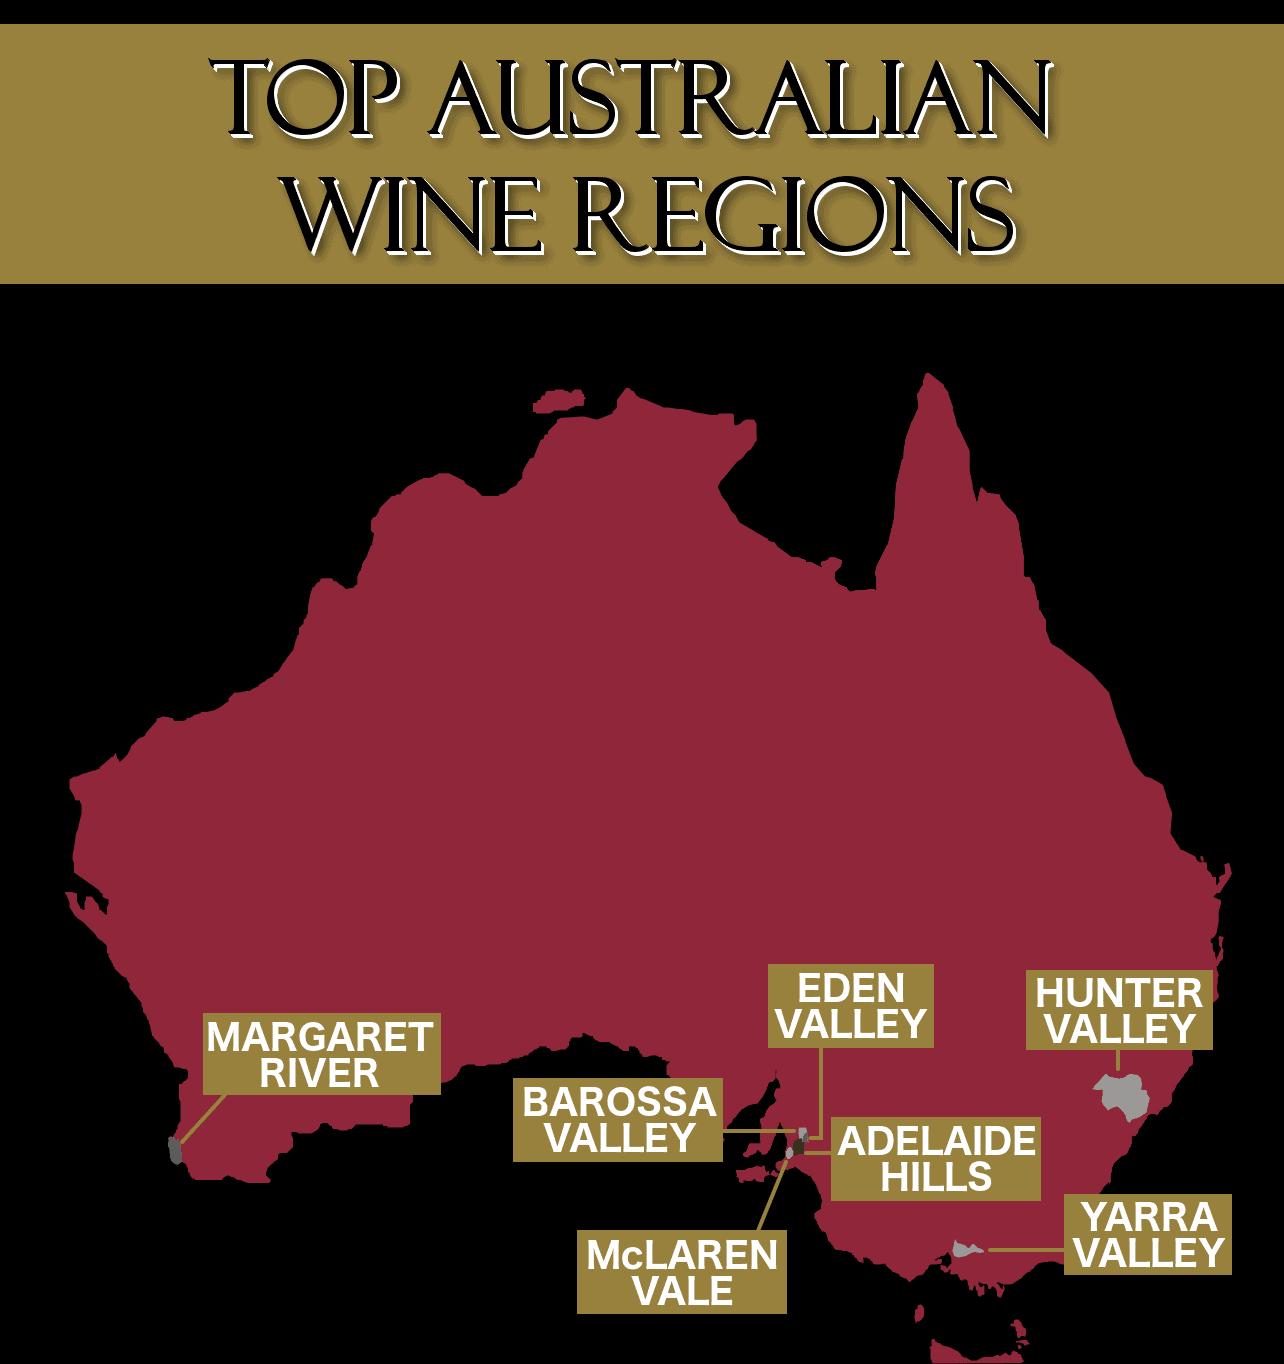 Map of wine regions in Australia